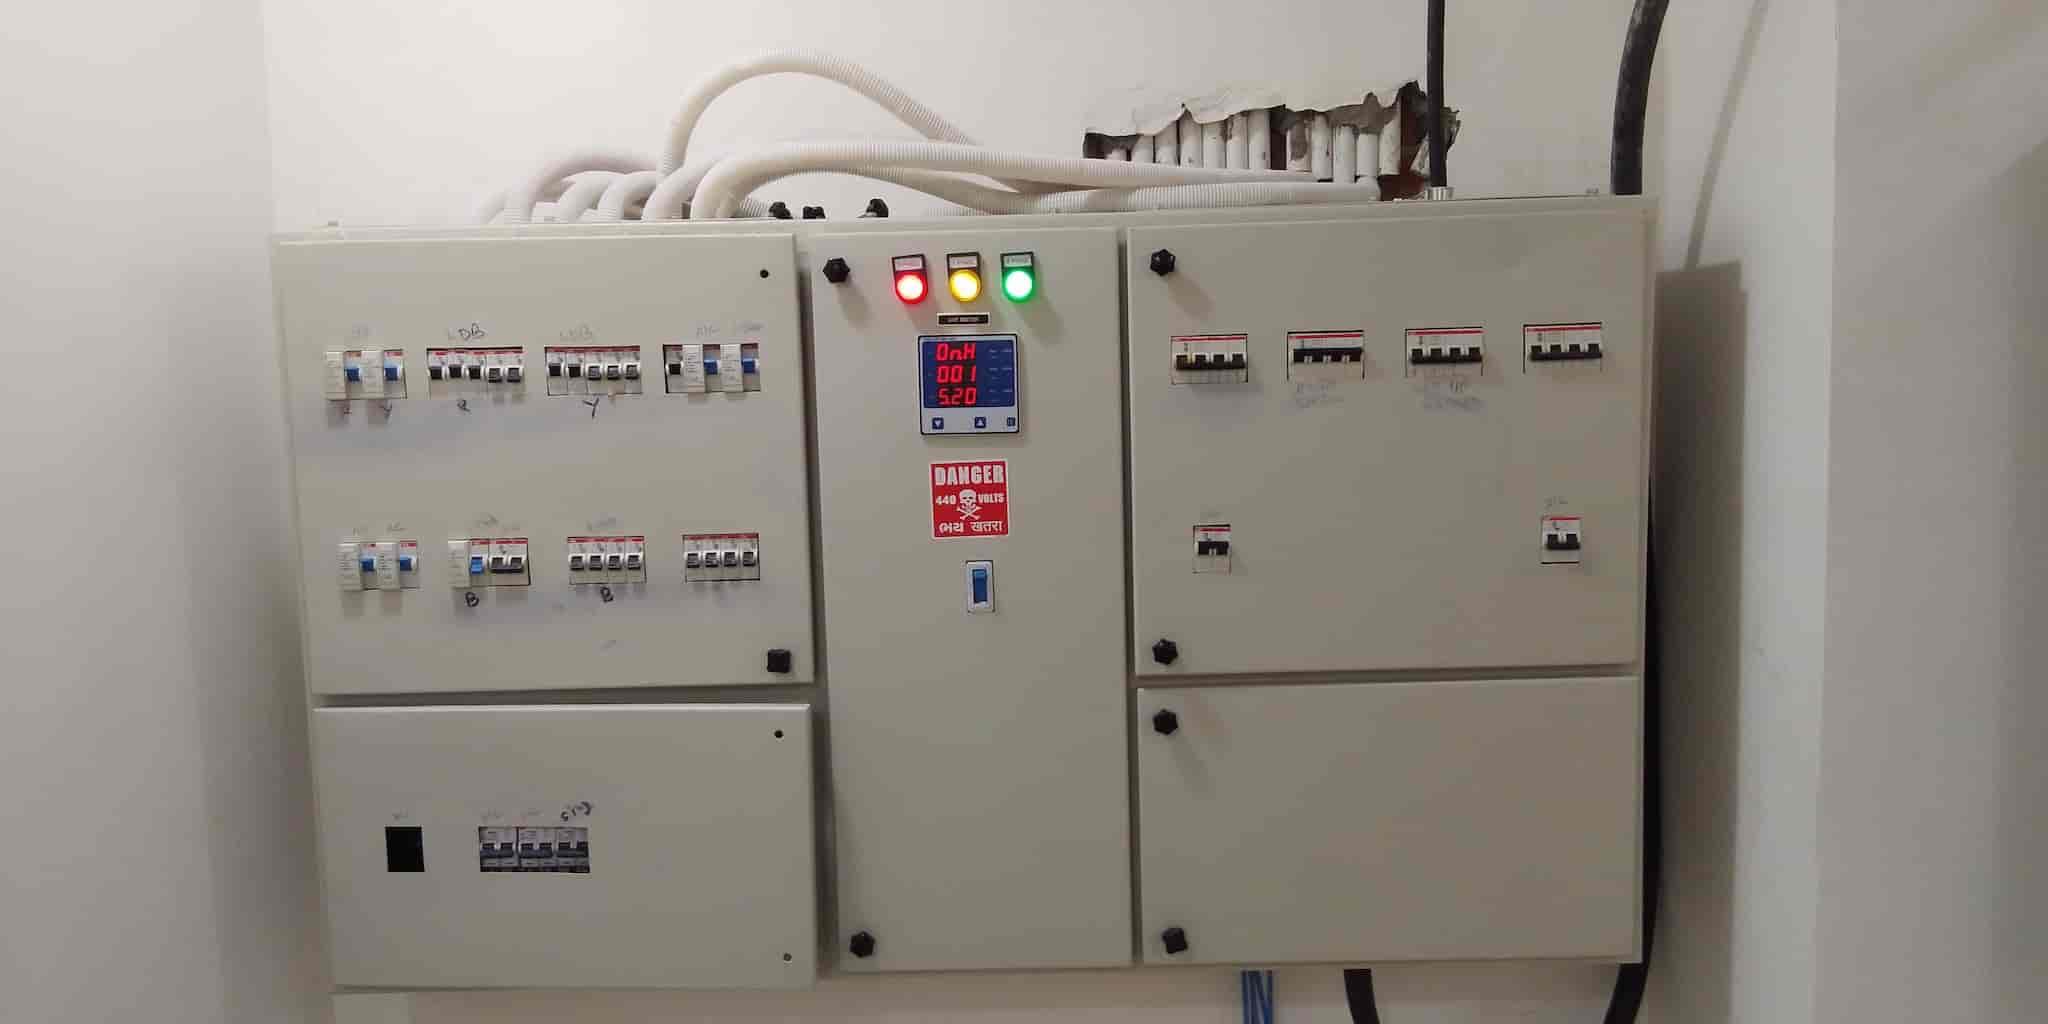 Jignesh Electrician Ghodasar Jiginesh Electricians Bad Circuit Breaker In Ahmedabad Justdial